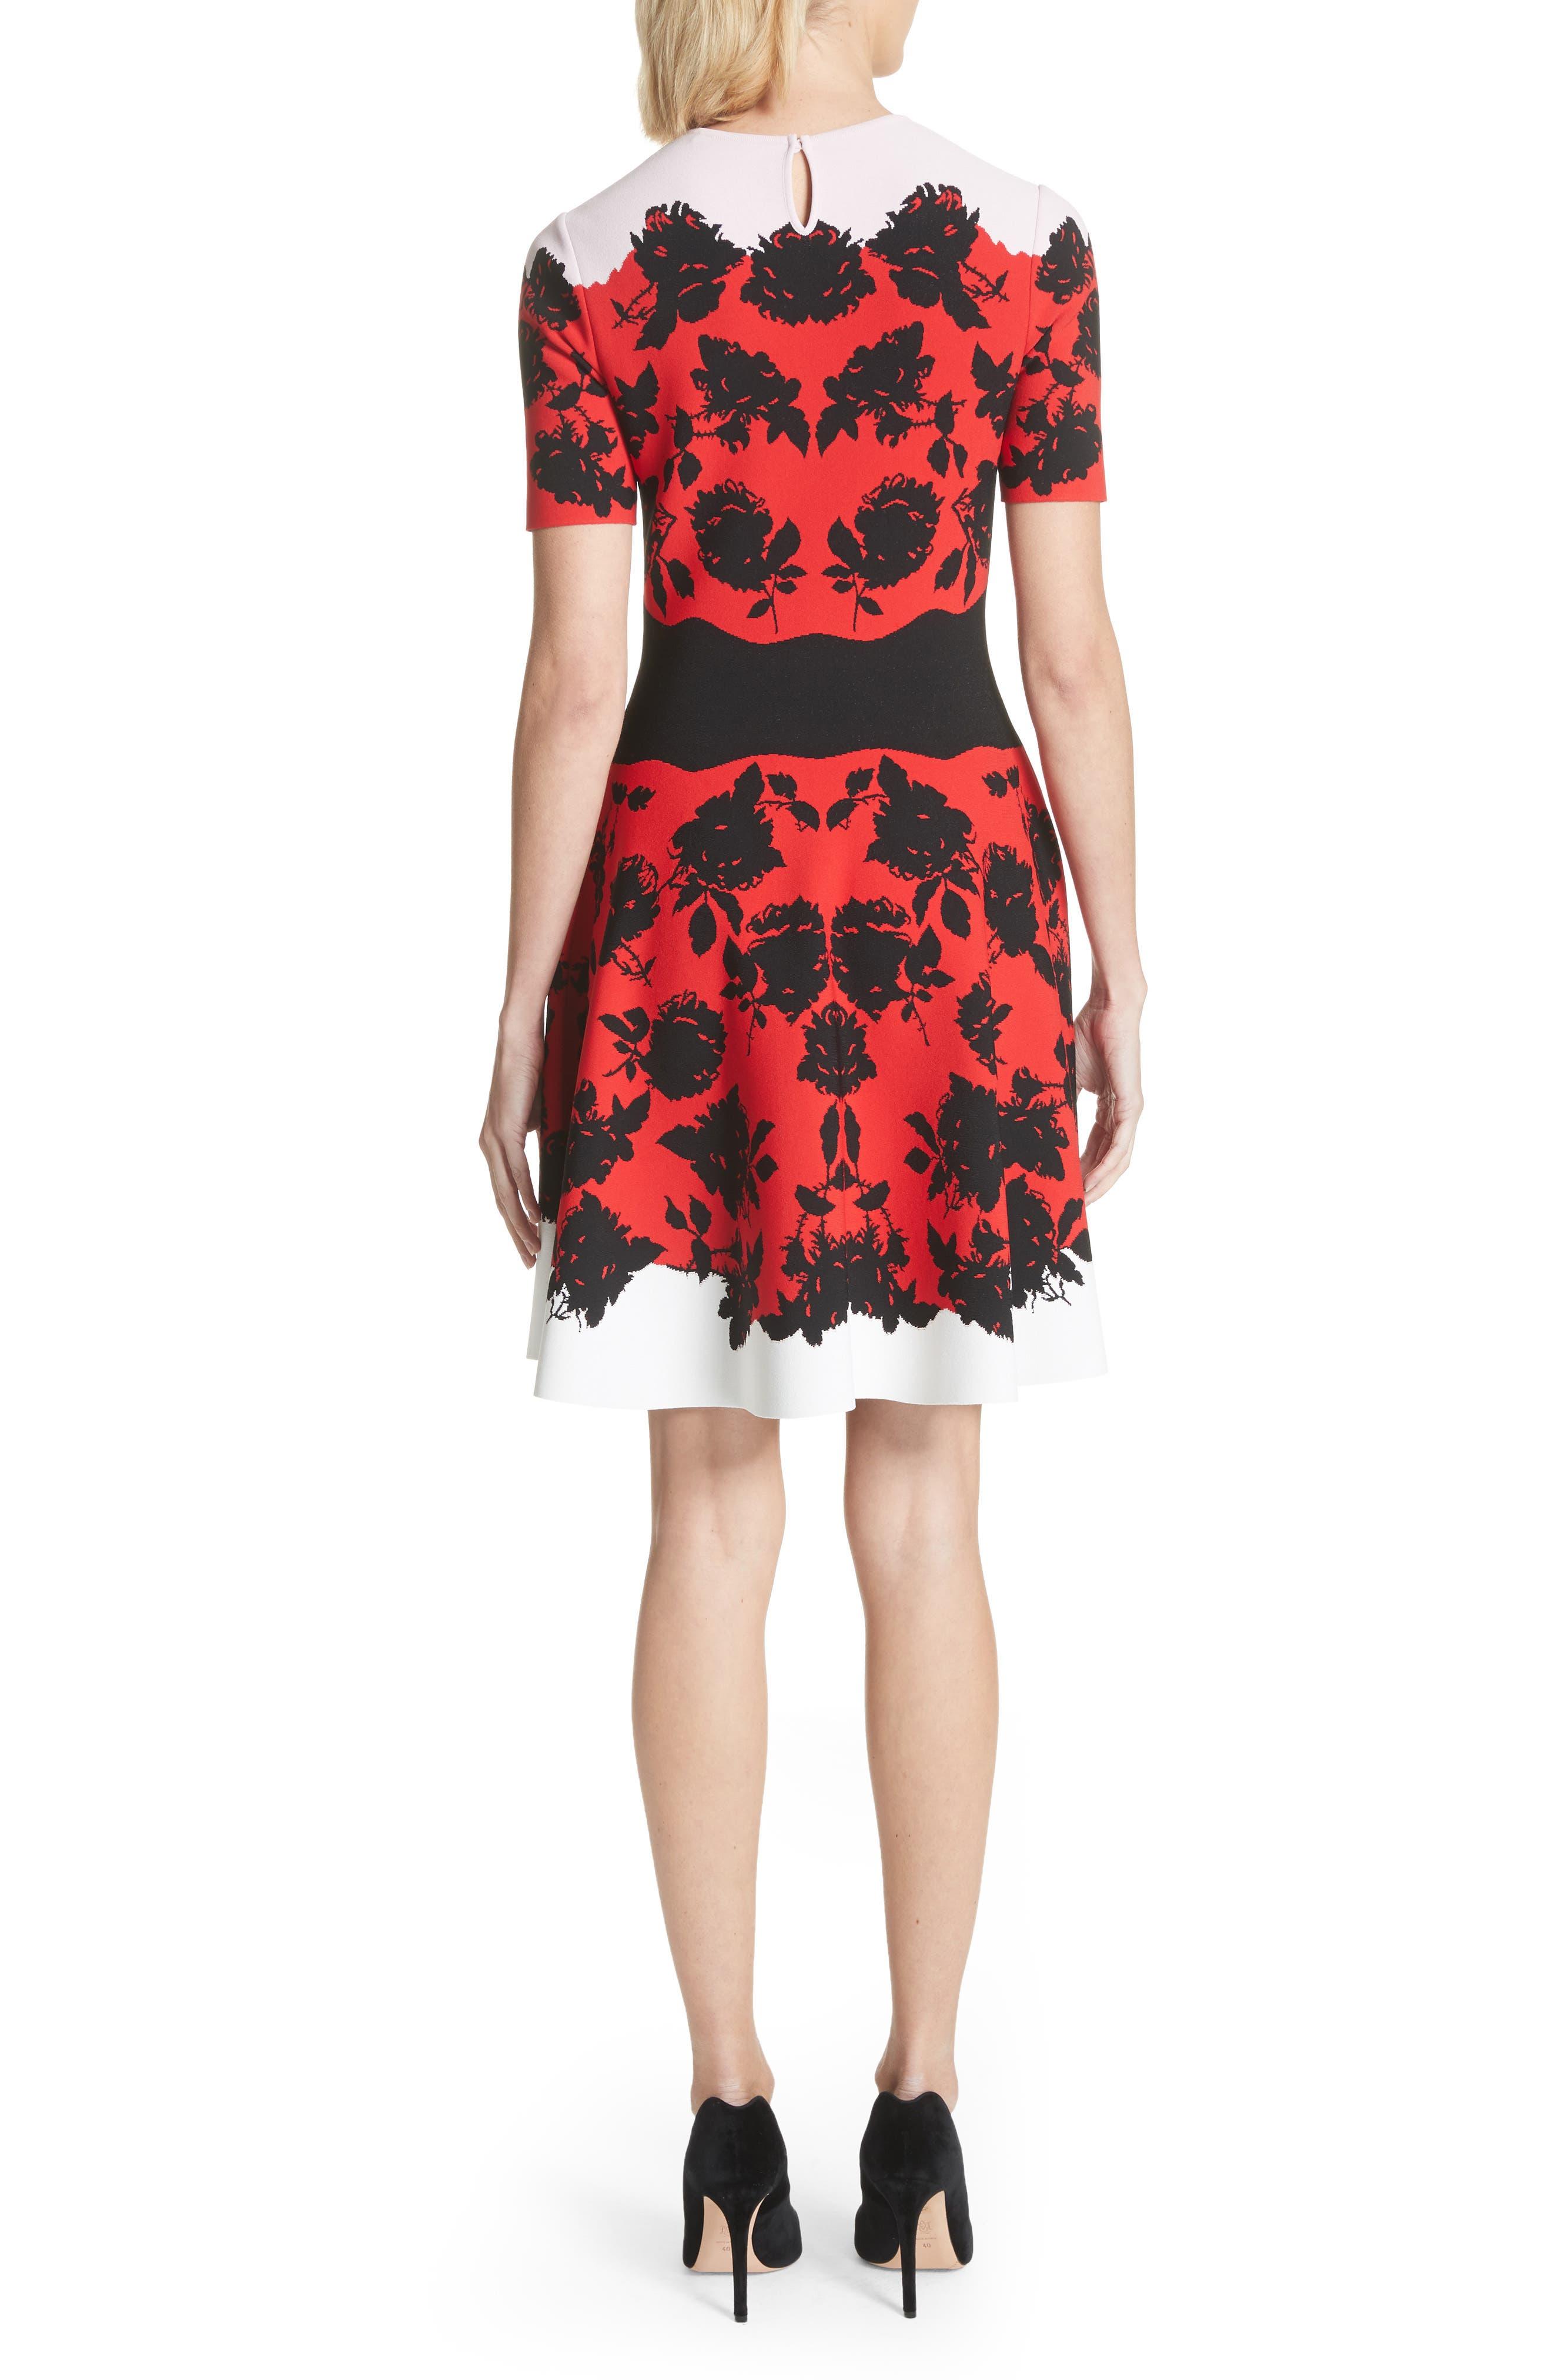 Rose Jacquard Knit Flounce Dress,                             Alternate thumbnail 2, color,                             Red/ Black/ Ivory/ Pink